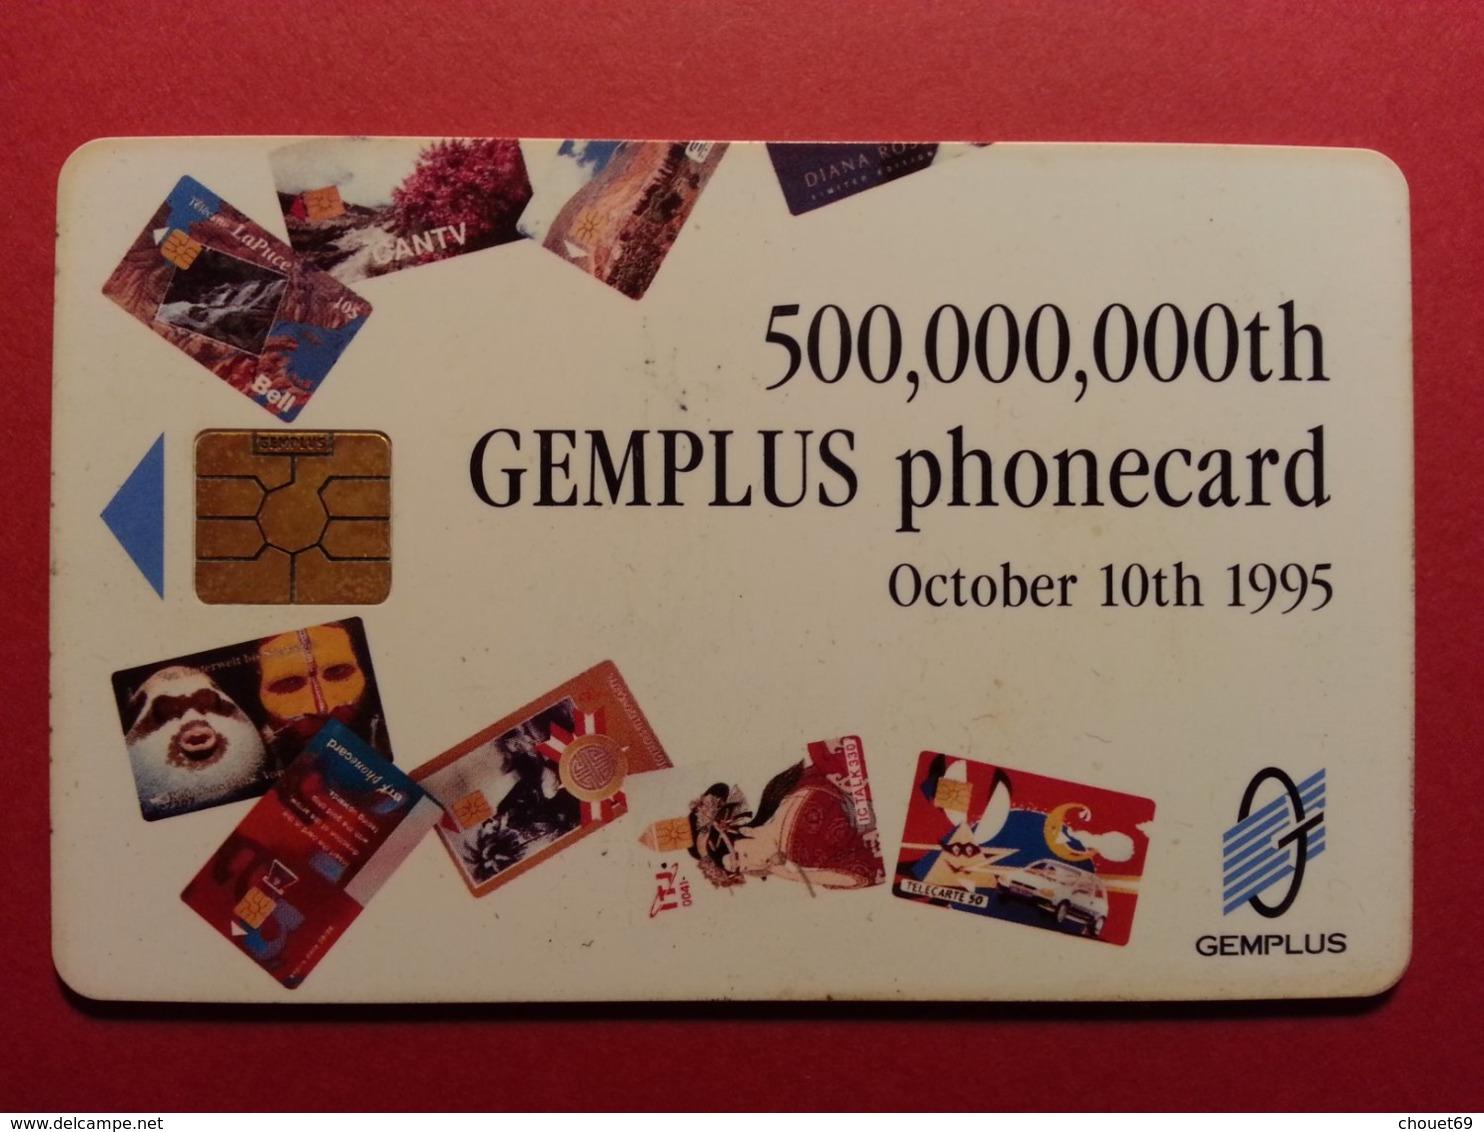 Carte Gemplus 500.000.000th Phonecards Verso Telecom 95 October 1995 (BF1217 - Telefonkarten